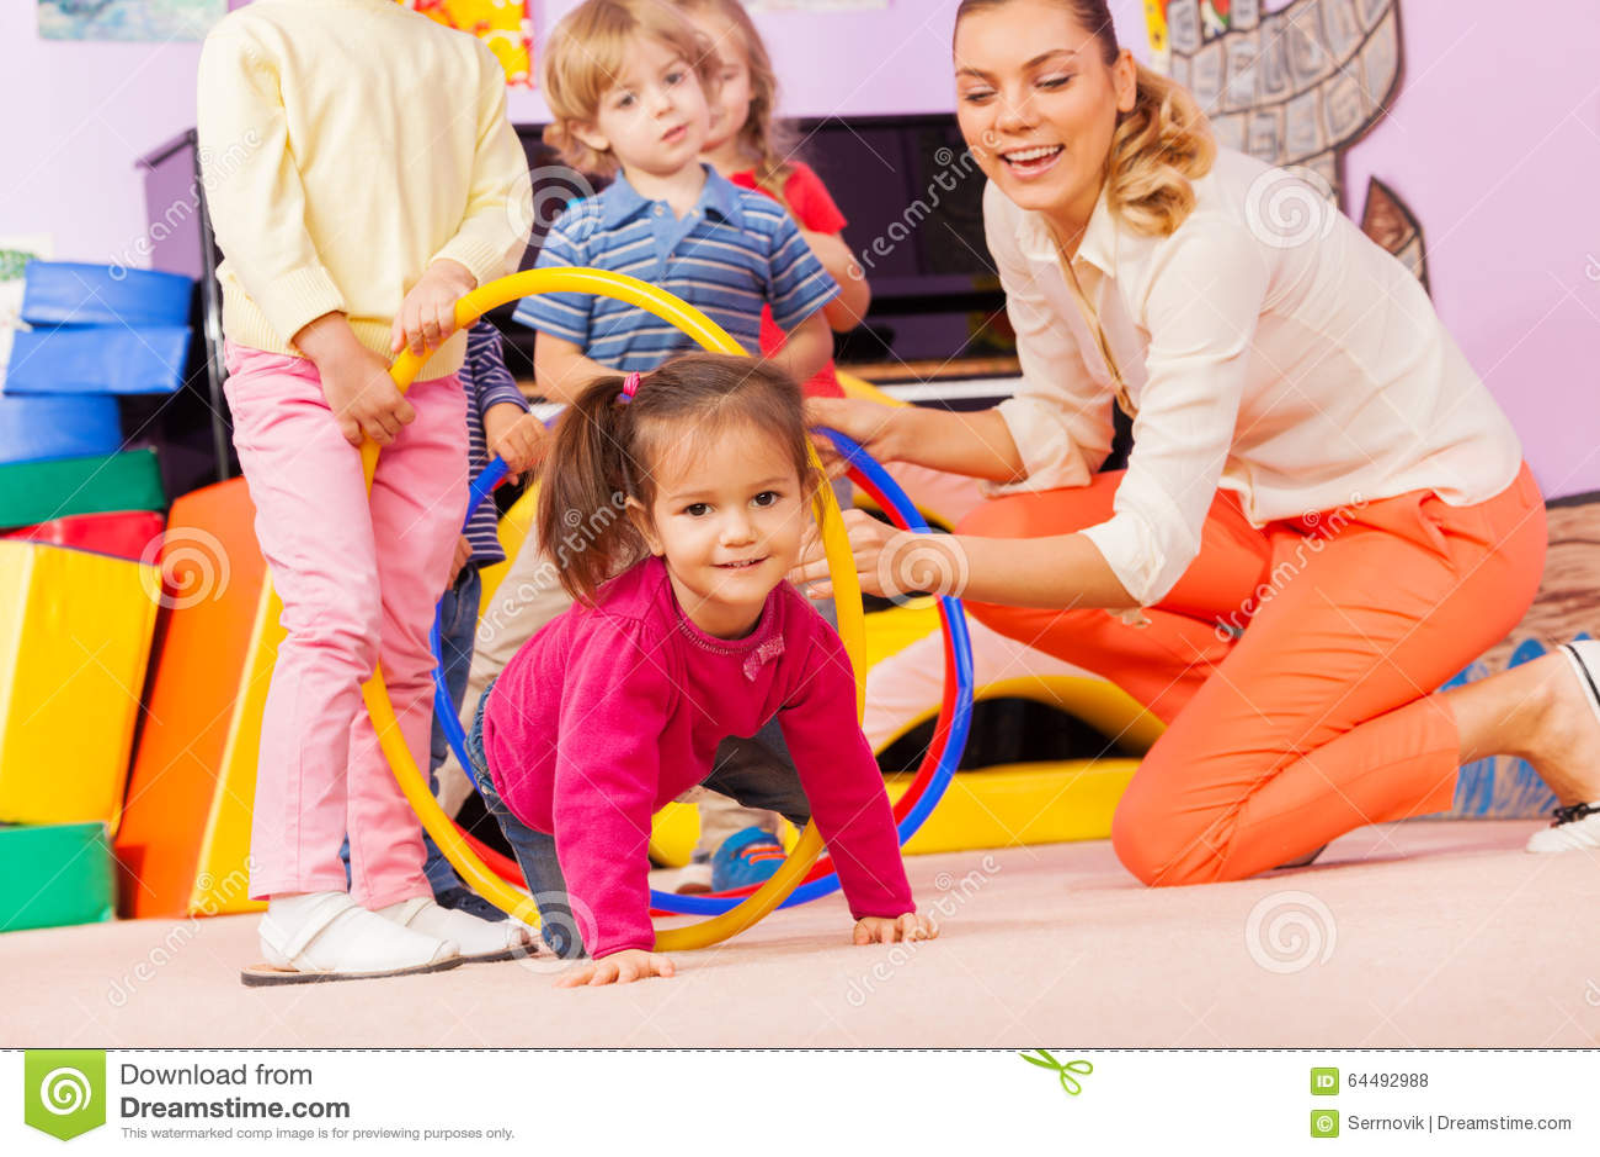 how to teach kindergarten children